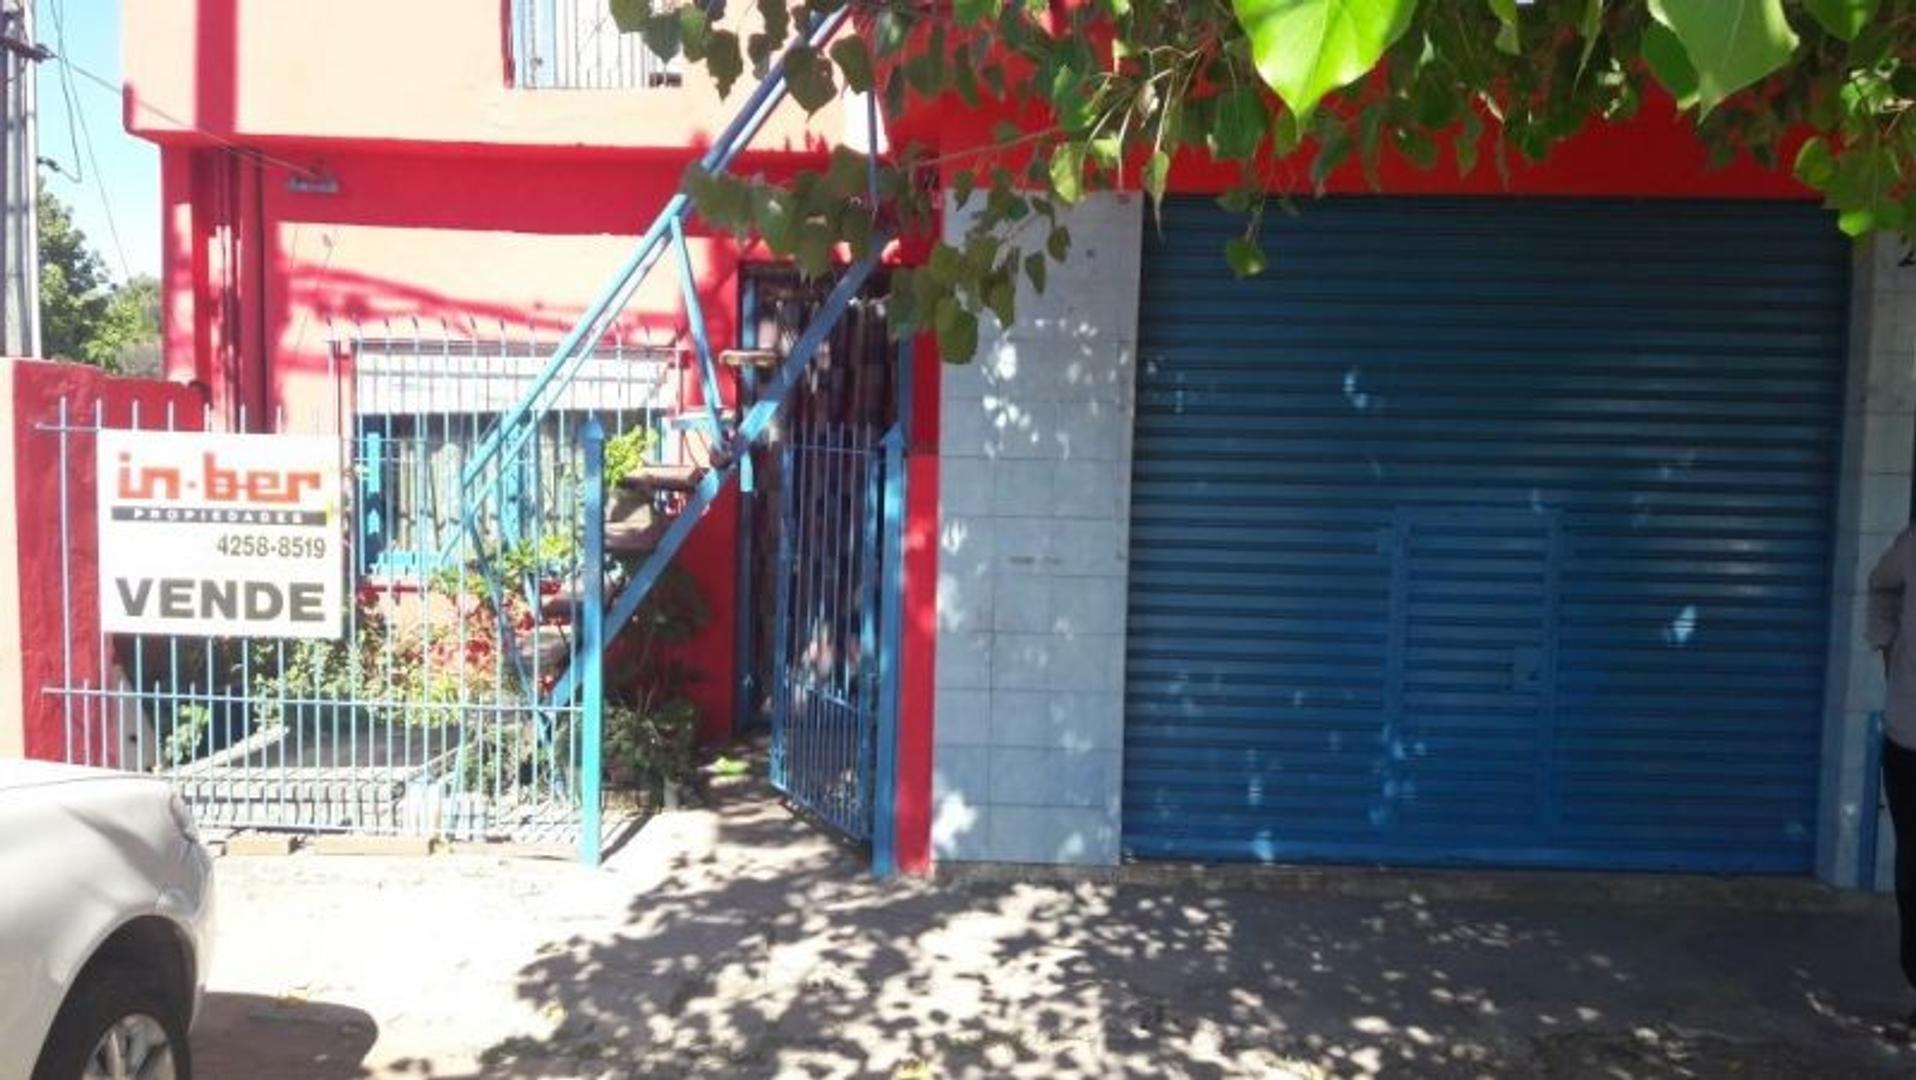 Casa - Venta - Argentina, Berazategui - calle Av. Vergara 2525